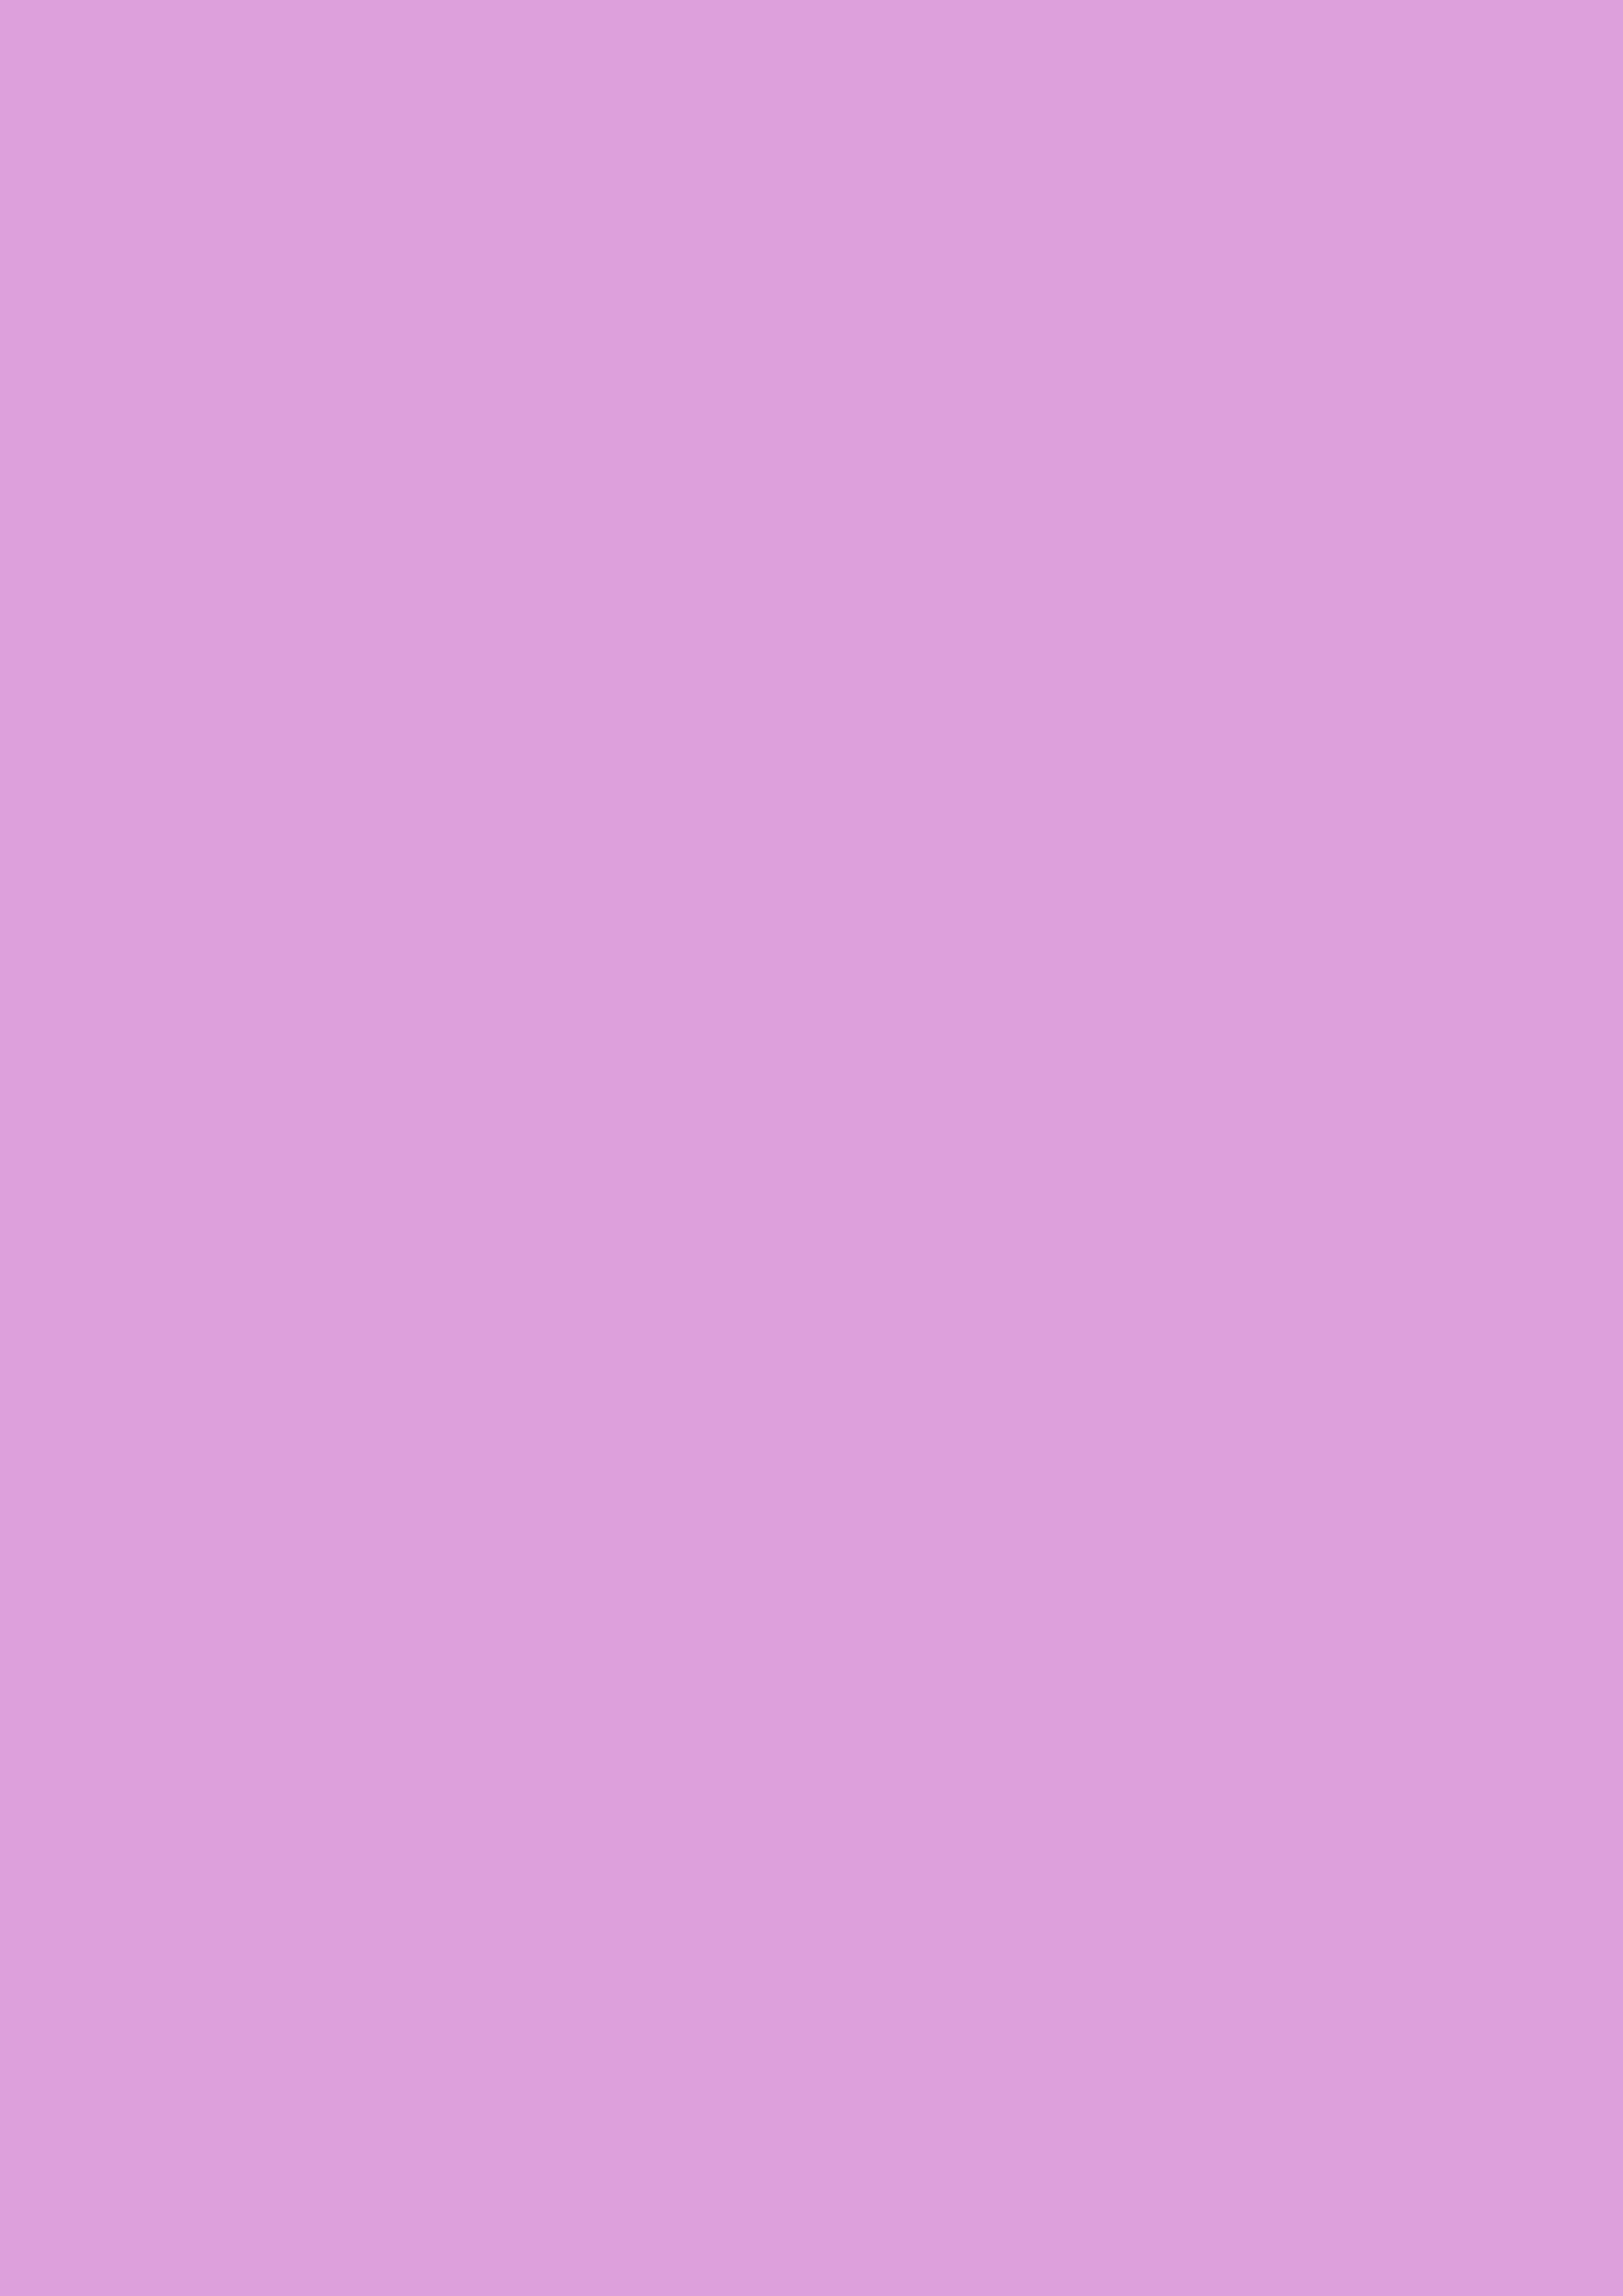 2480x3508 Plum Web Solid Color Background